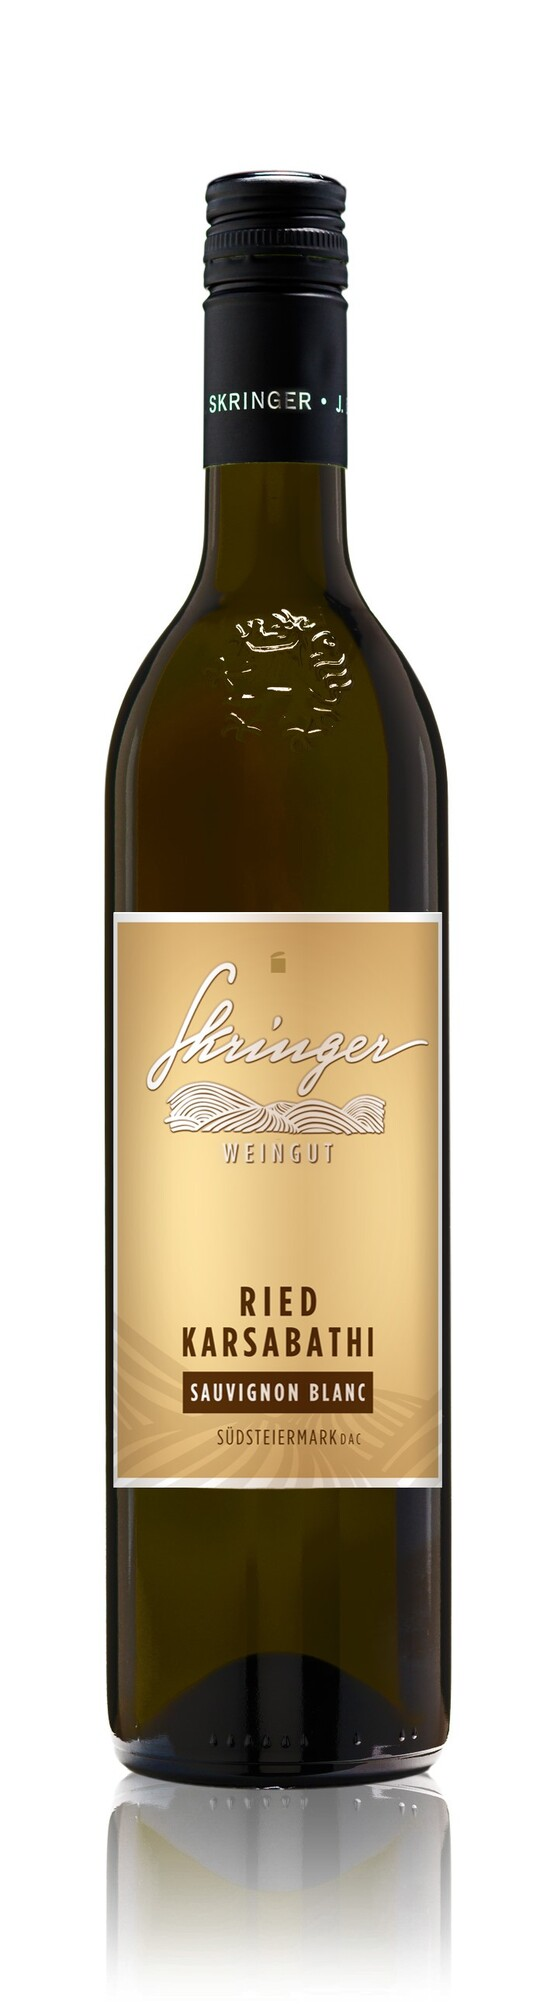 Sauvignon blanc Ried Karsabathi 2019, 0,75l